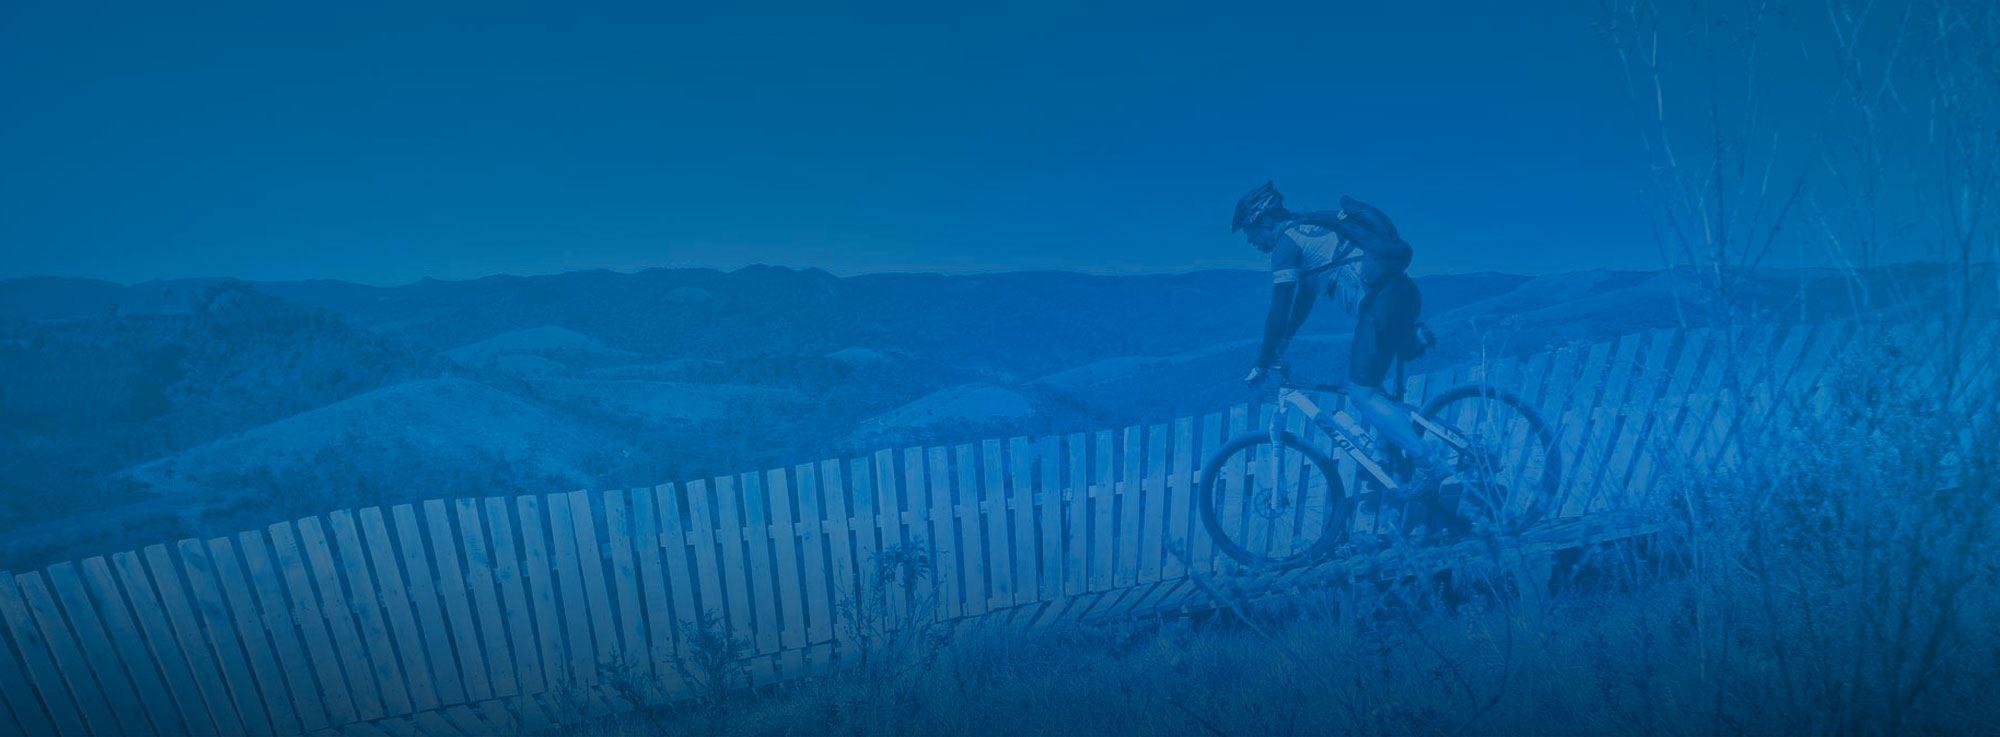 Francavilla Fontana: Colline Joniche Tour Bike